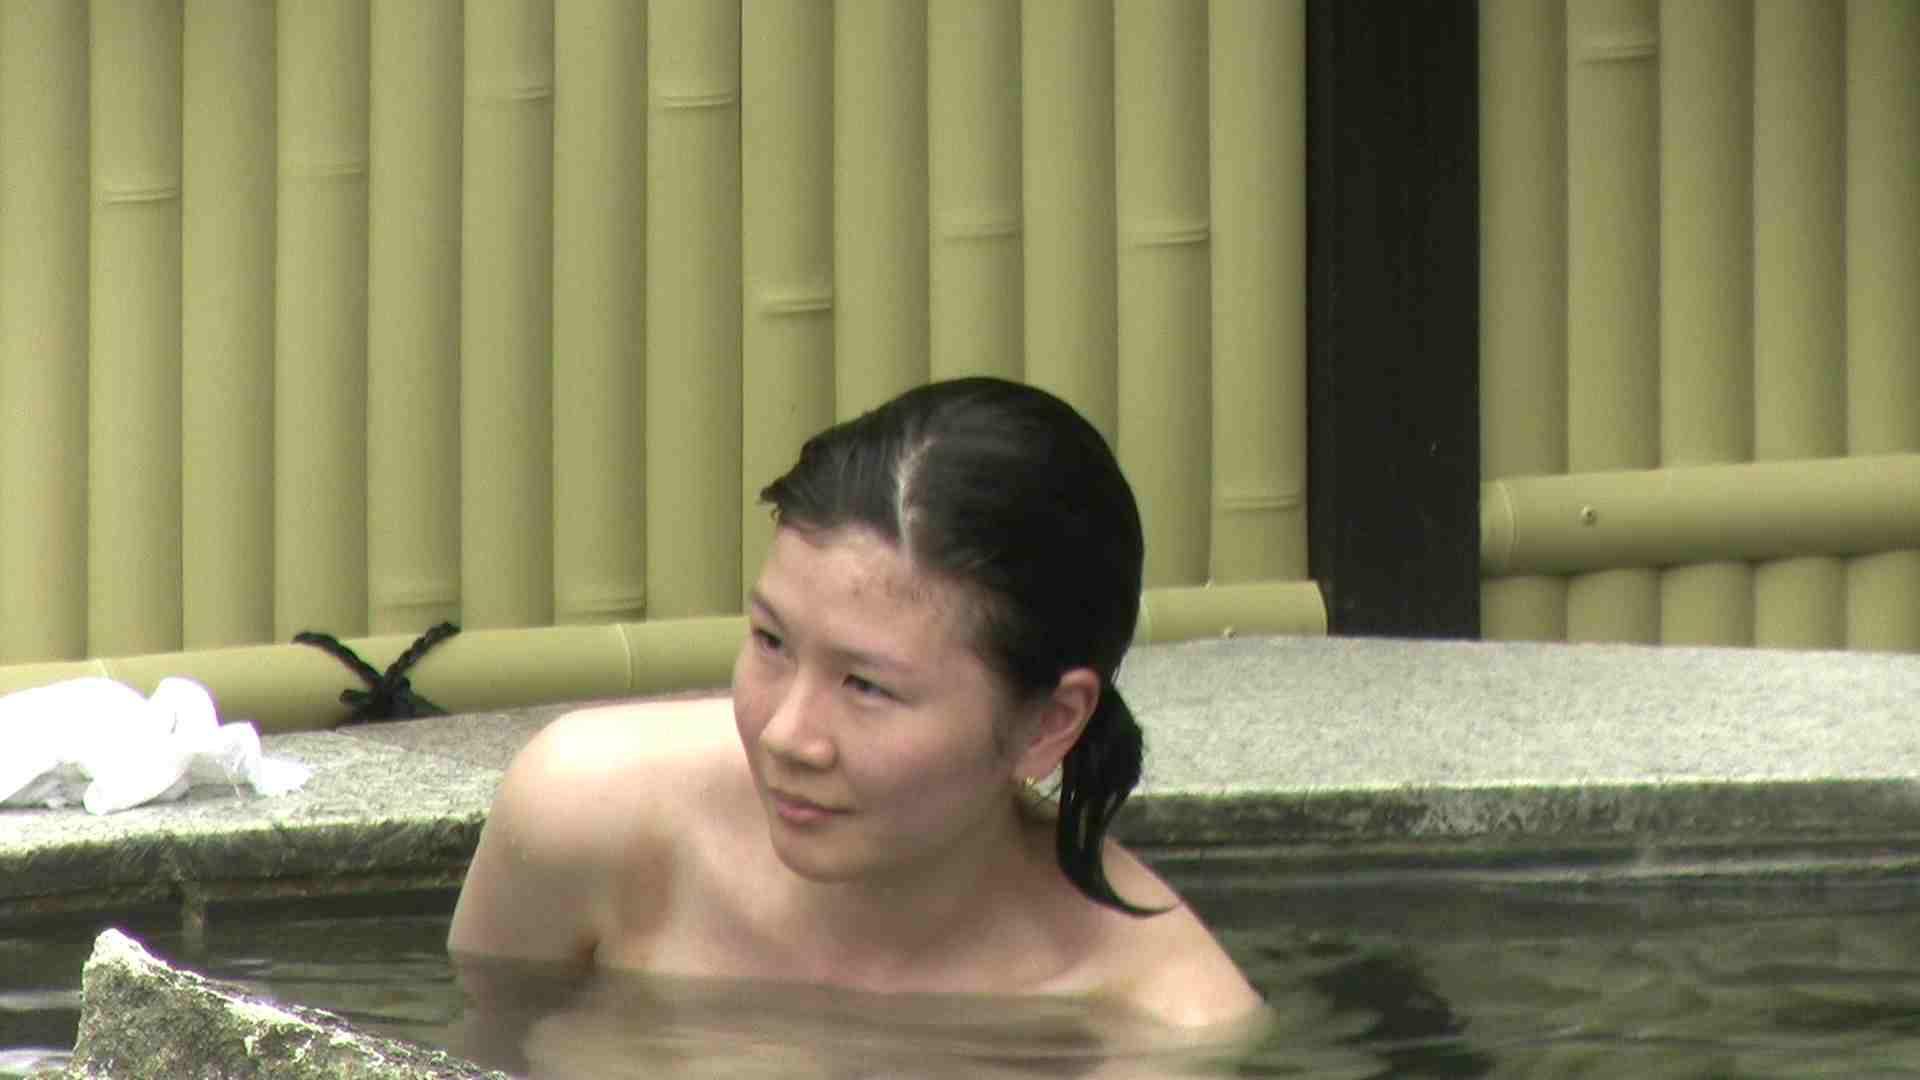 Aquaな露天風呂Vol.187 盗撮   HなOL  96pic 50